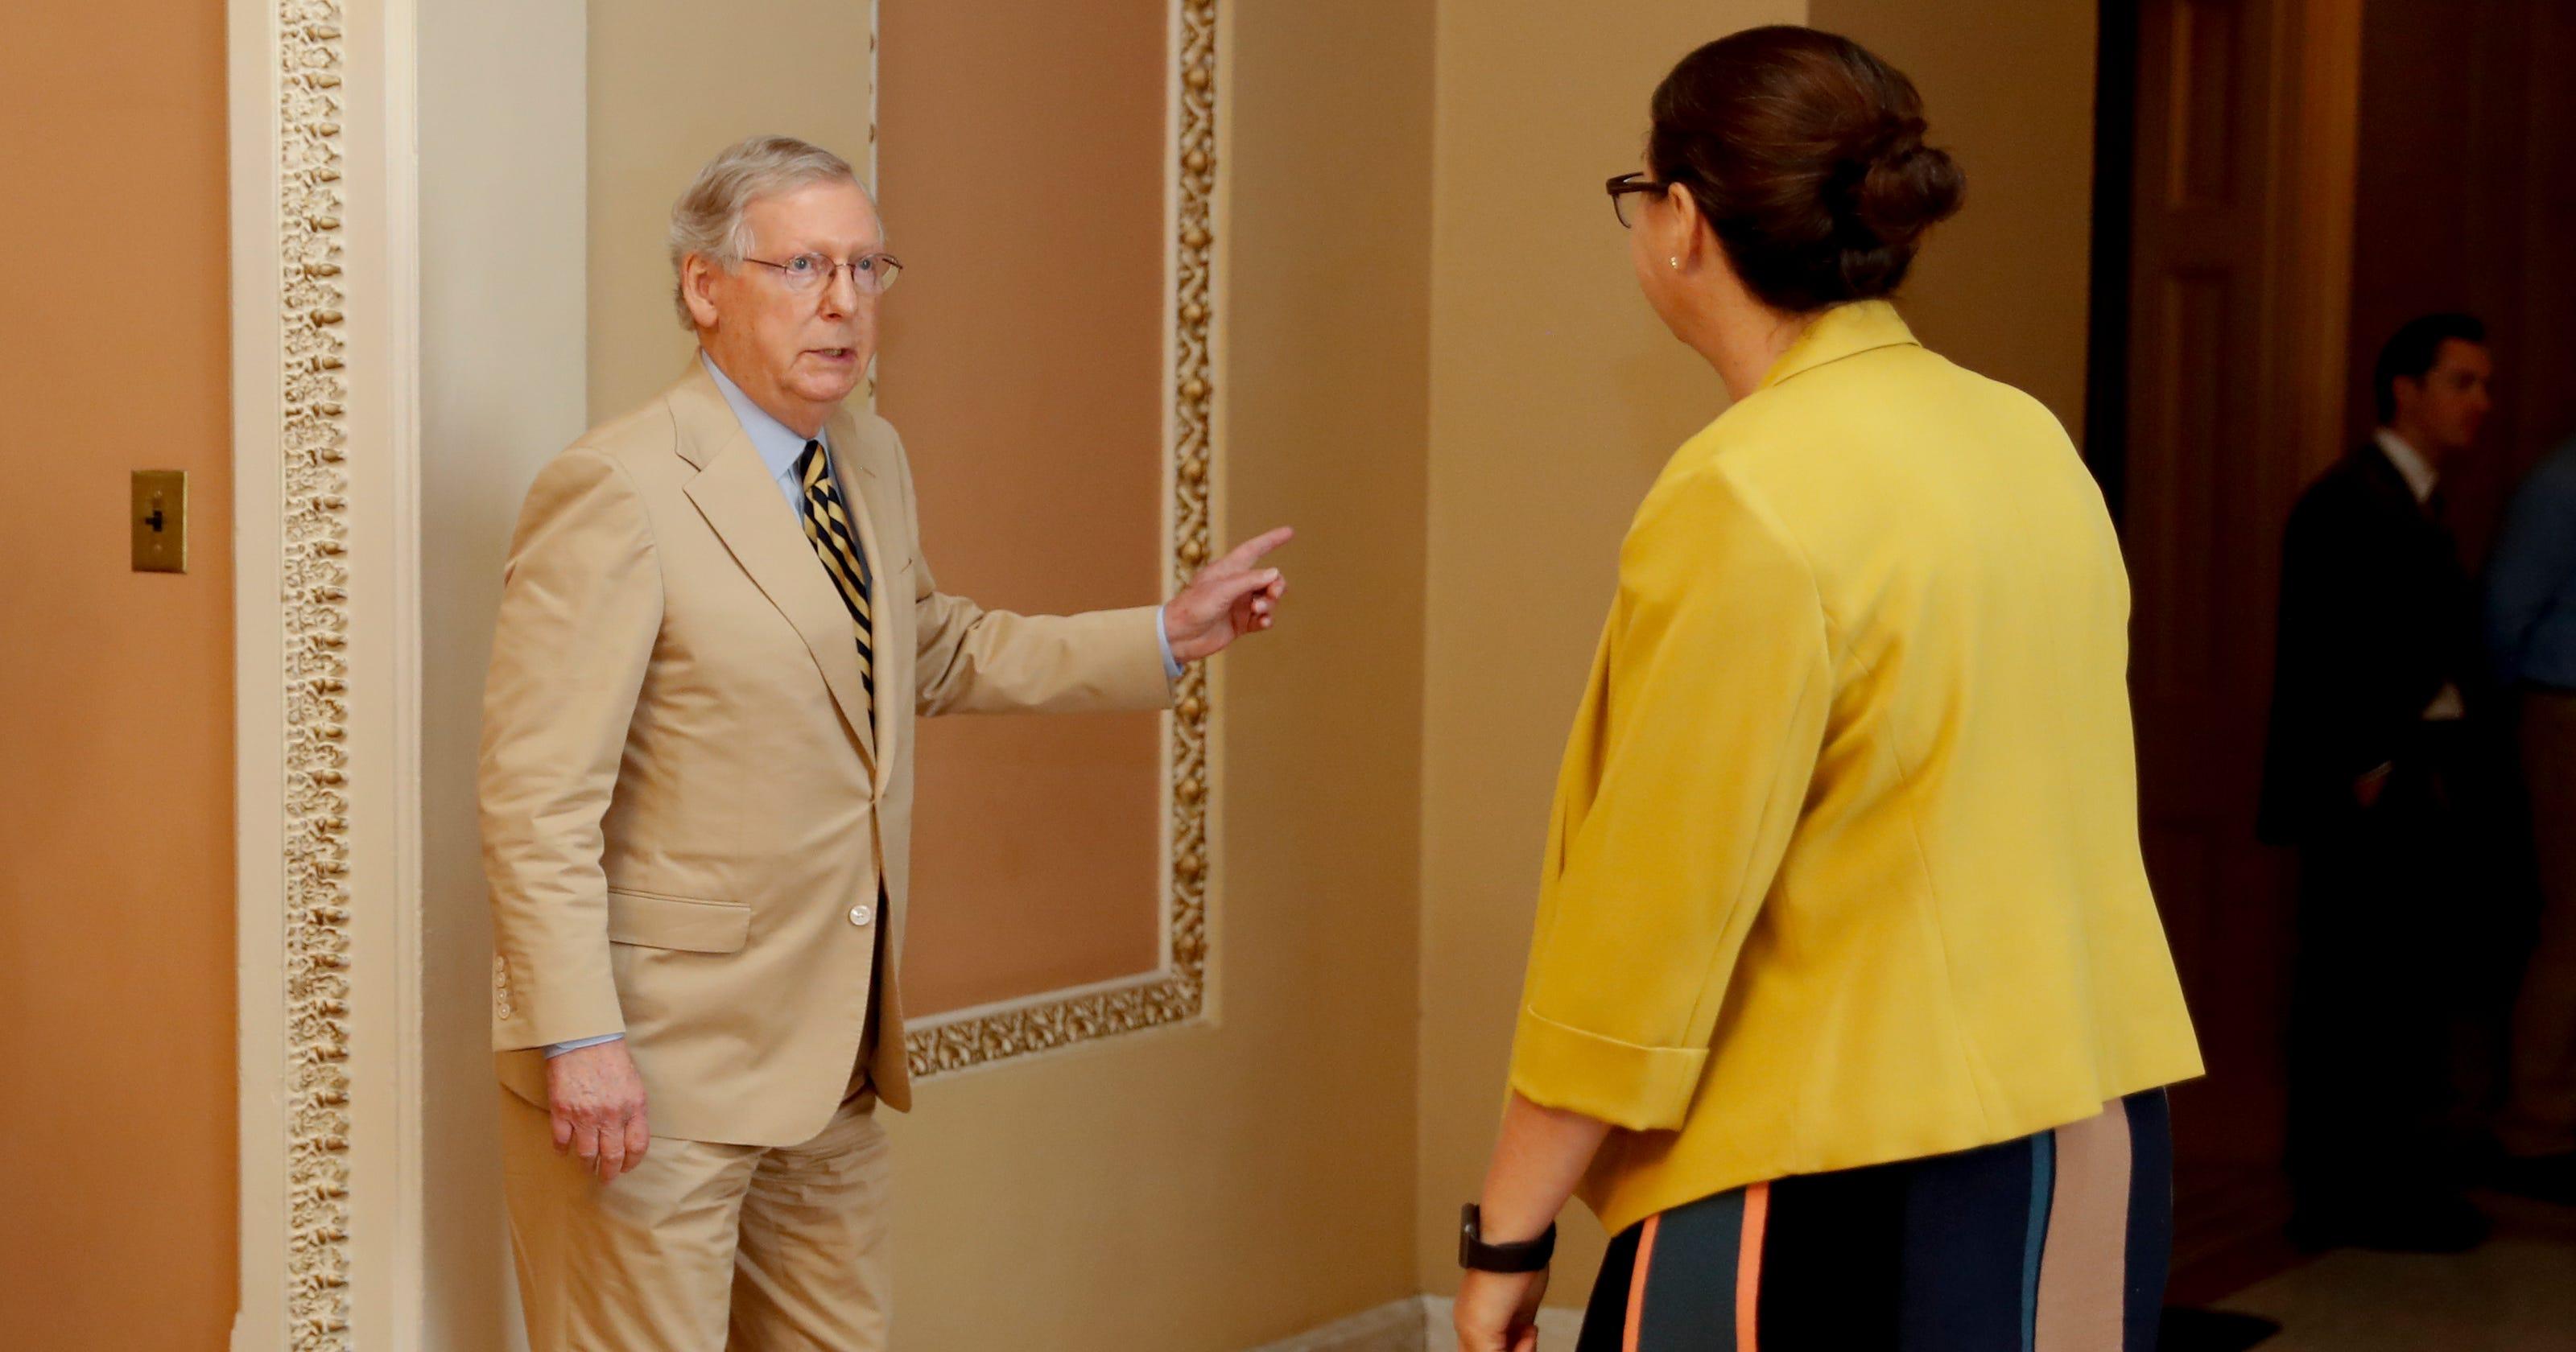 Lacking votes, Senate GOP delays health care vote